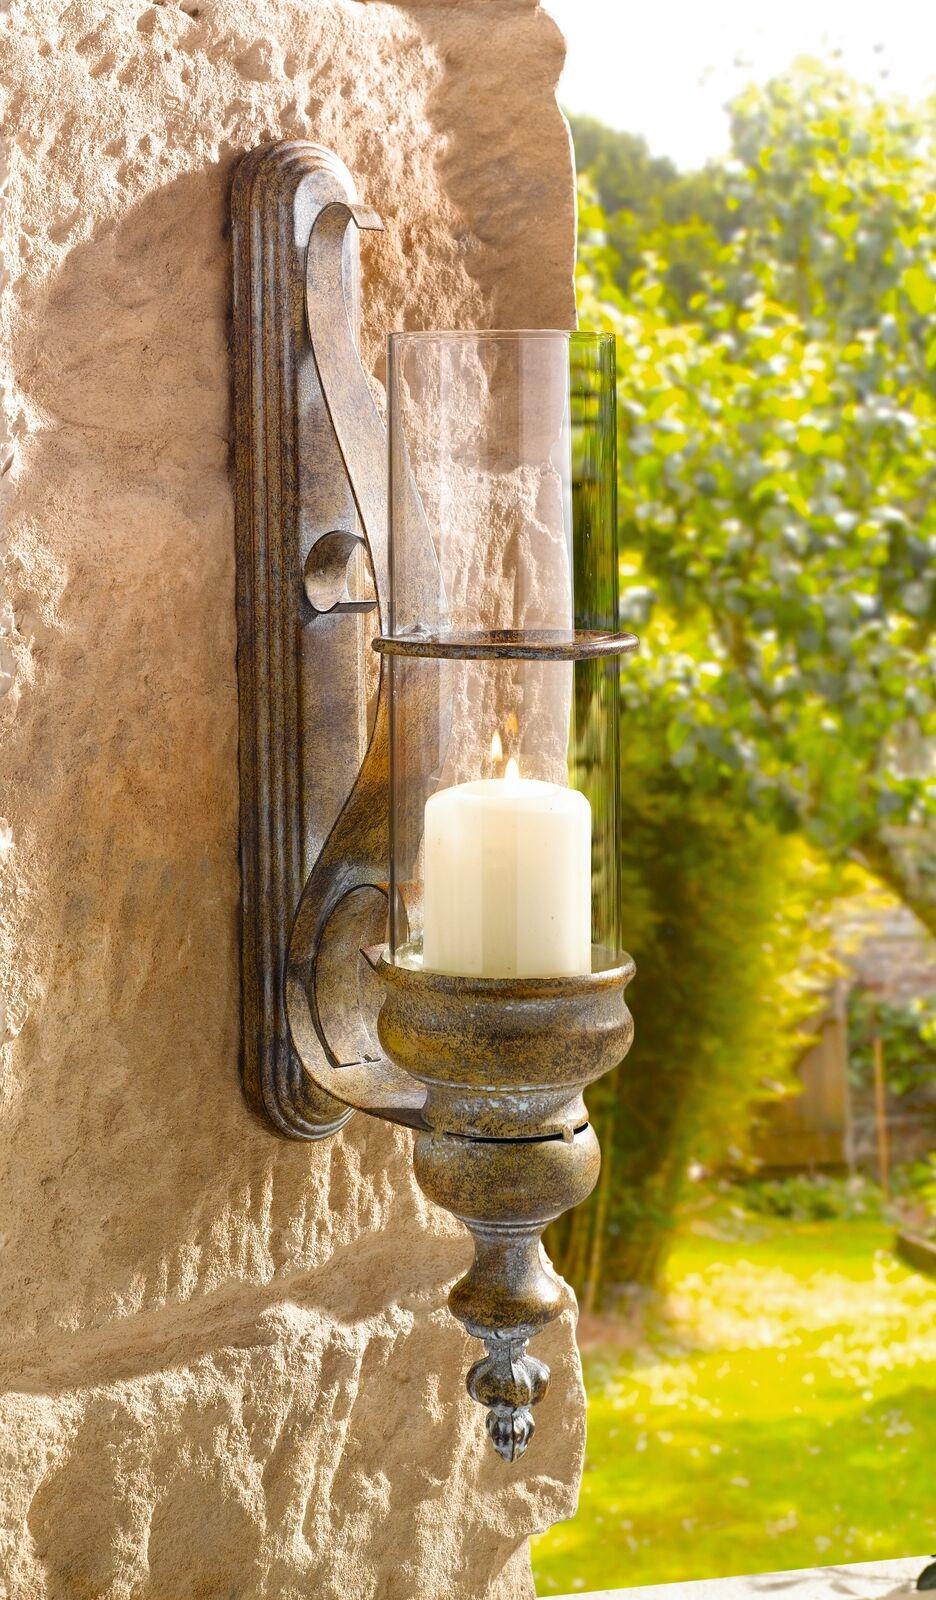 Metal European-style Wall Candle Lantern - 19 in Wall Metal Candle Lantern